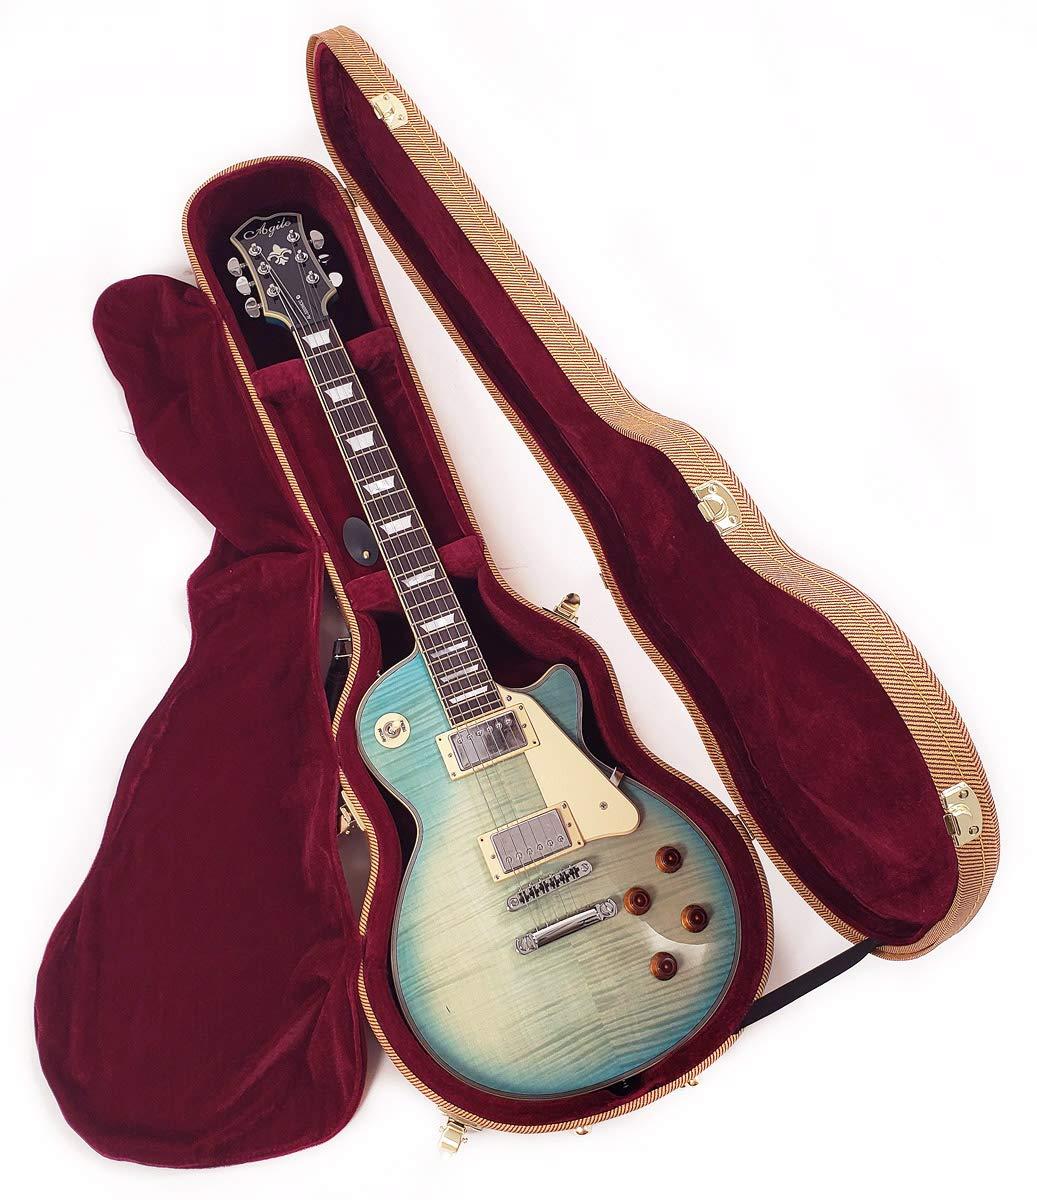 Douglas EGC-400LP Tweed/Burgundy Premium Case for Gibson & Epiphone Les Paul Guitar